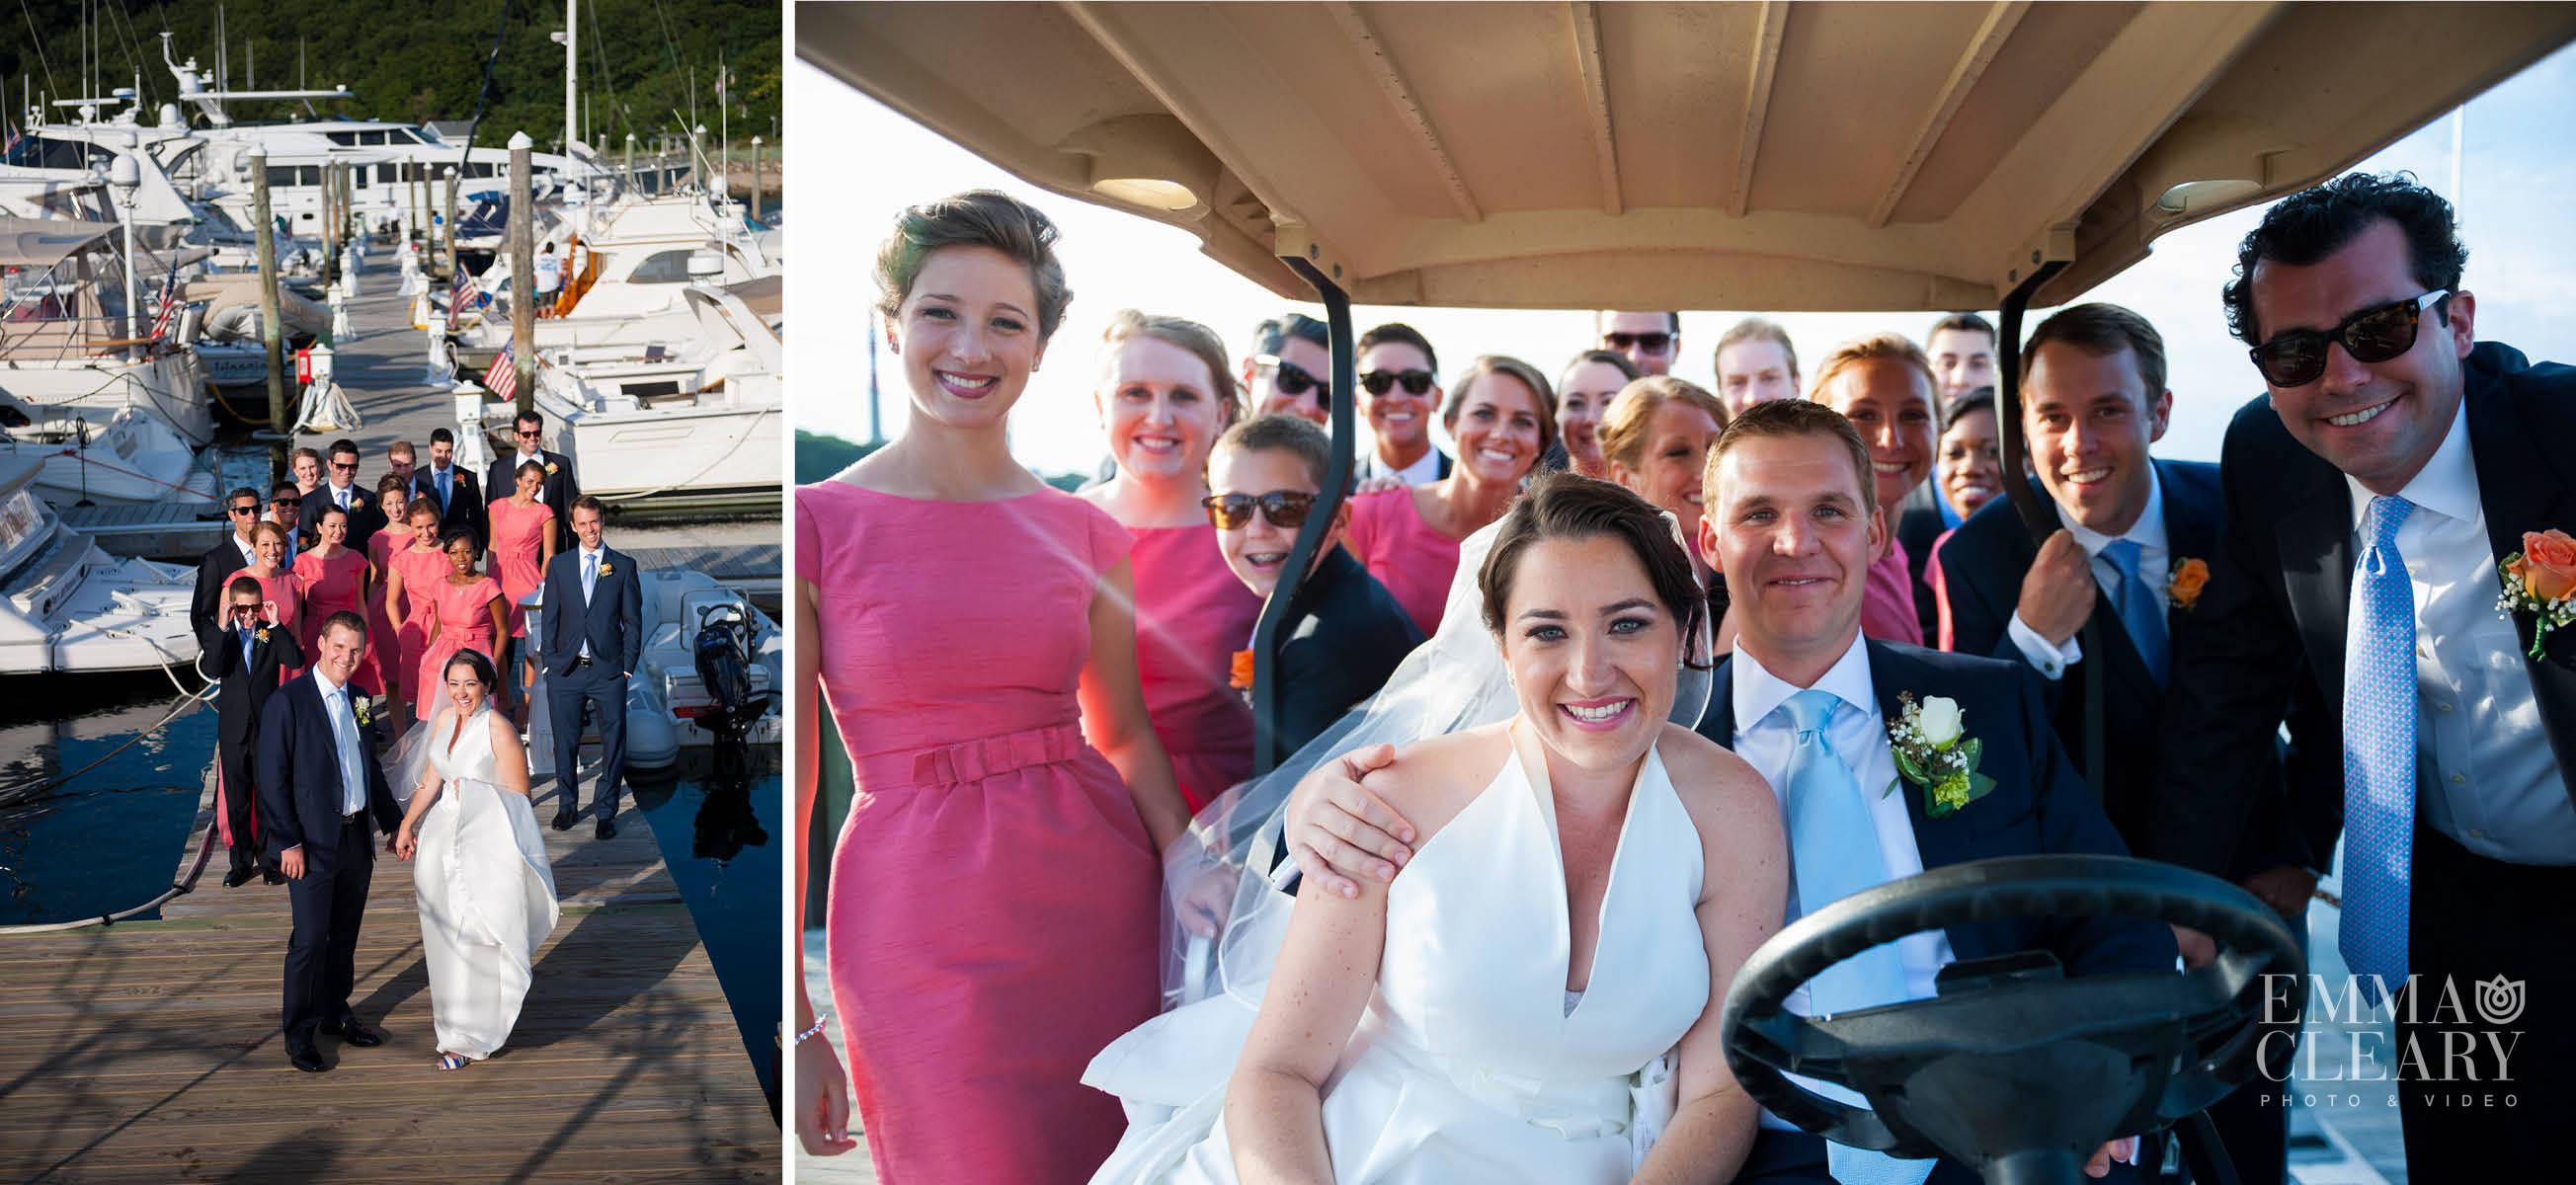 Emma Cleary Photography, Danfords Marina wedding12